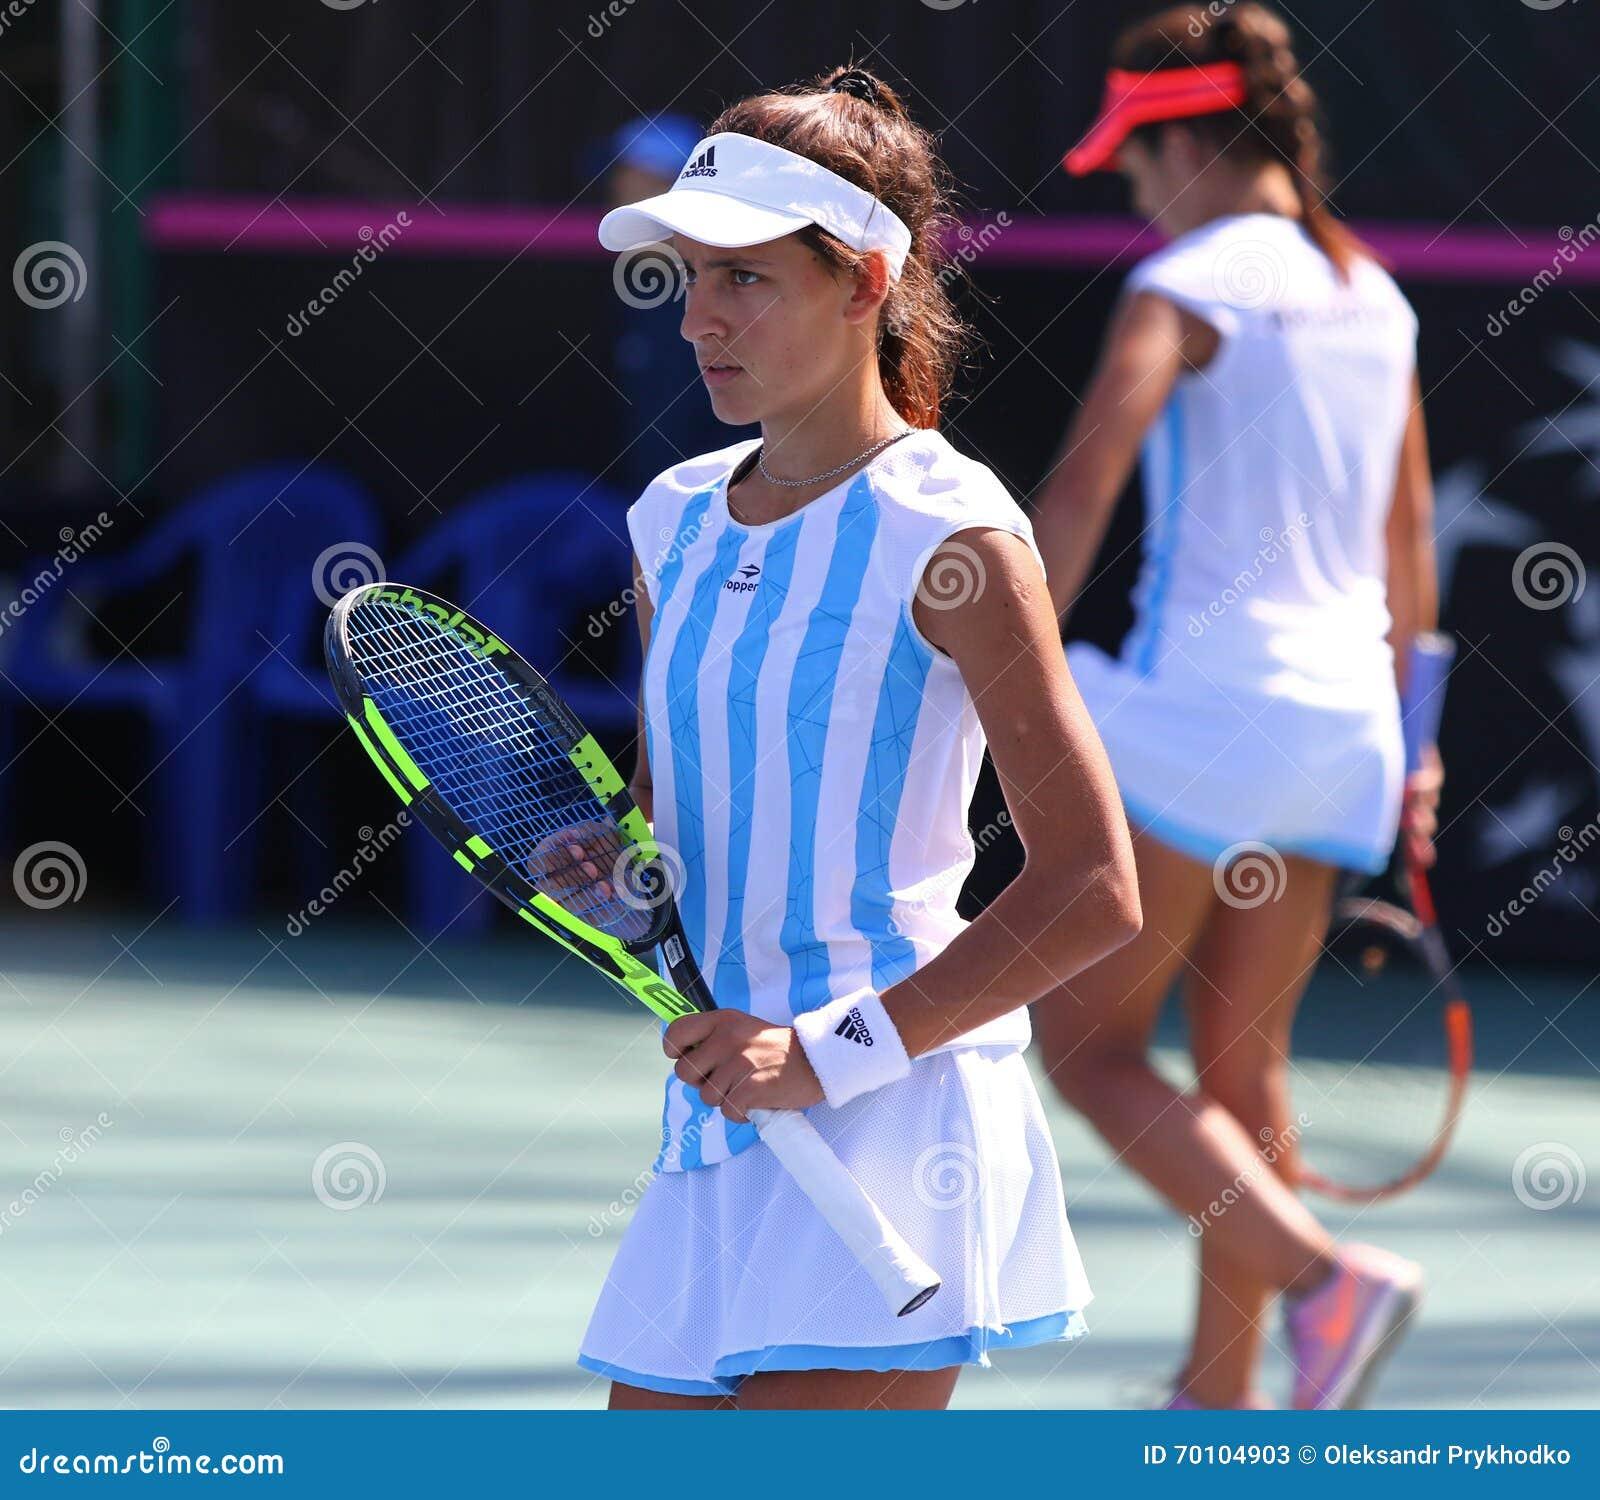 fedcup tennis match ukraine vs argentina editorial stock photo image of arena player 70104903. Black Bedroom Furniture Sets. Home Design Ideas